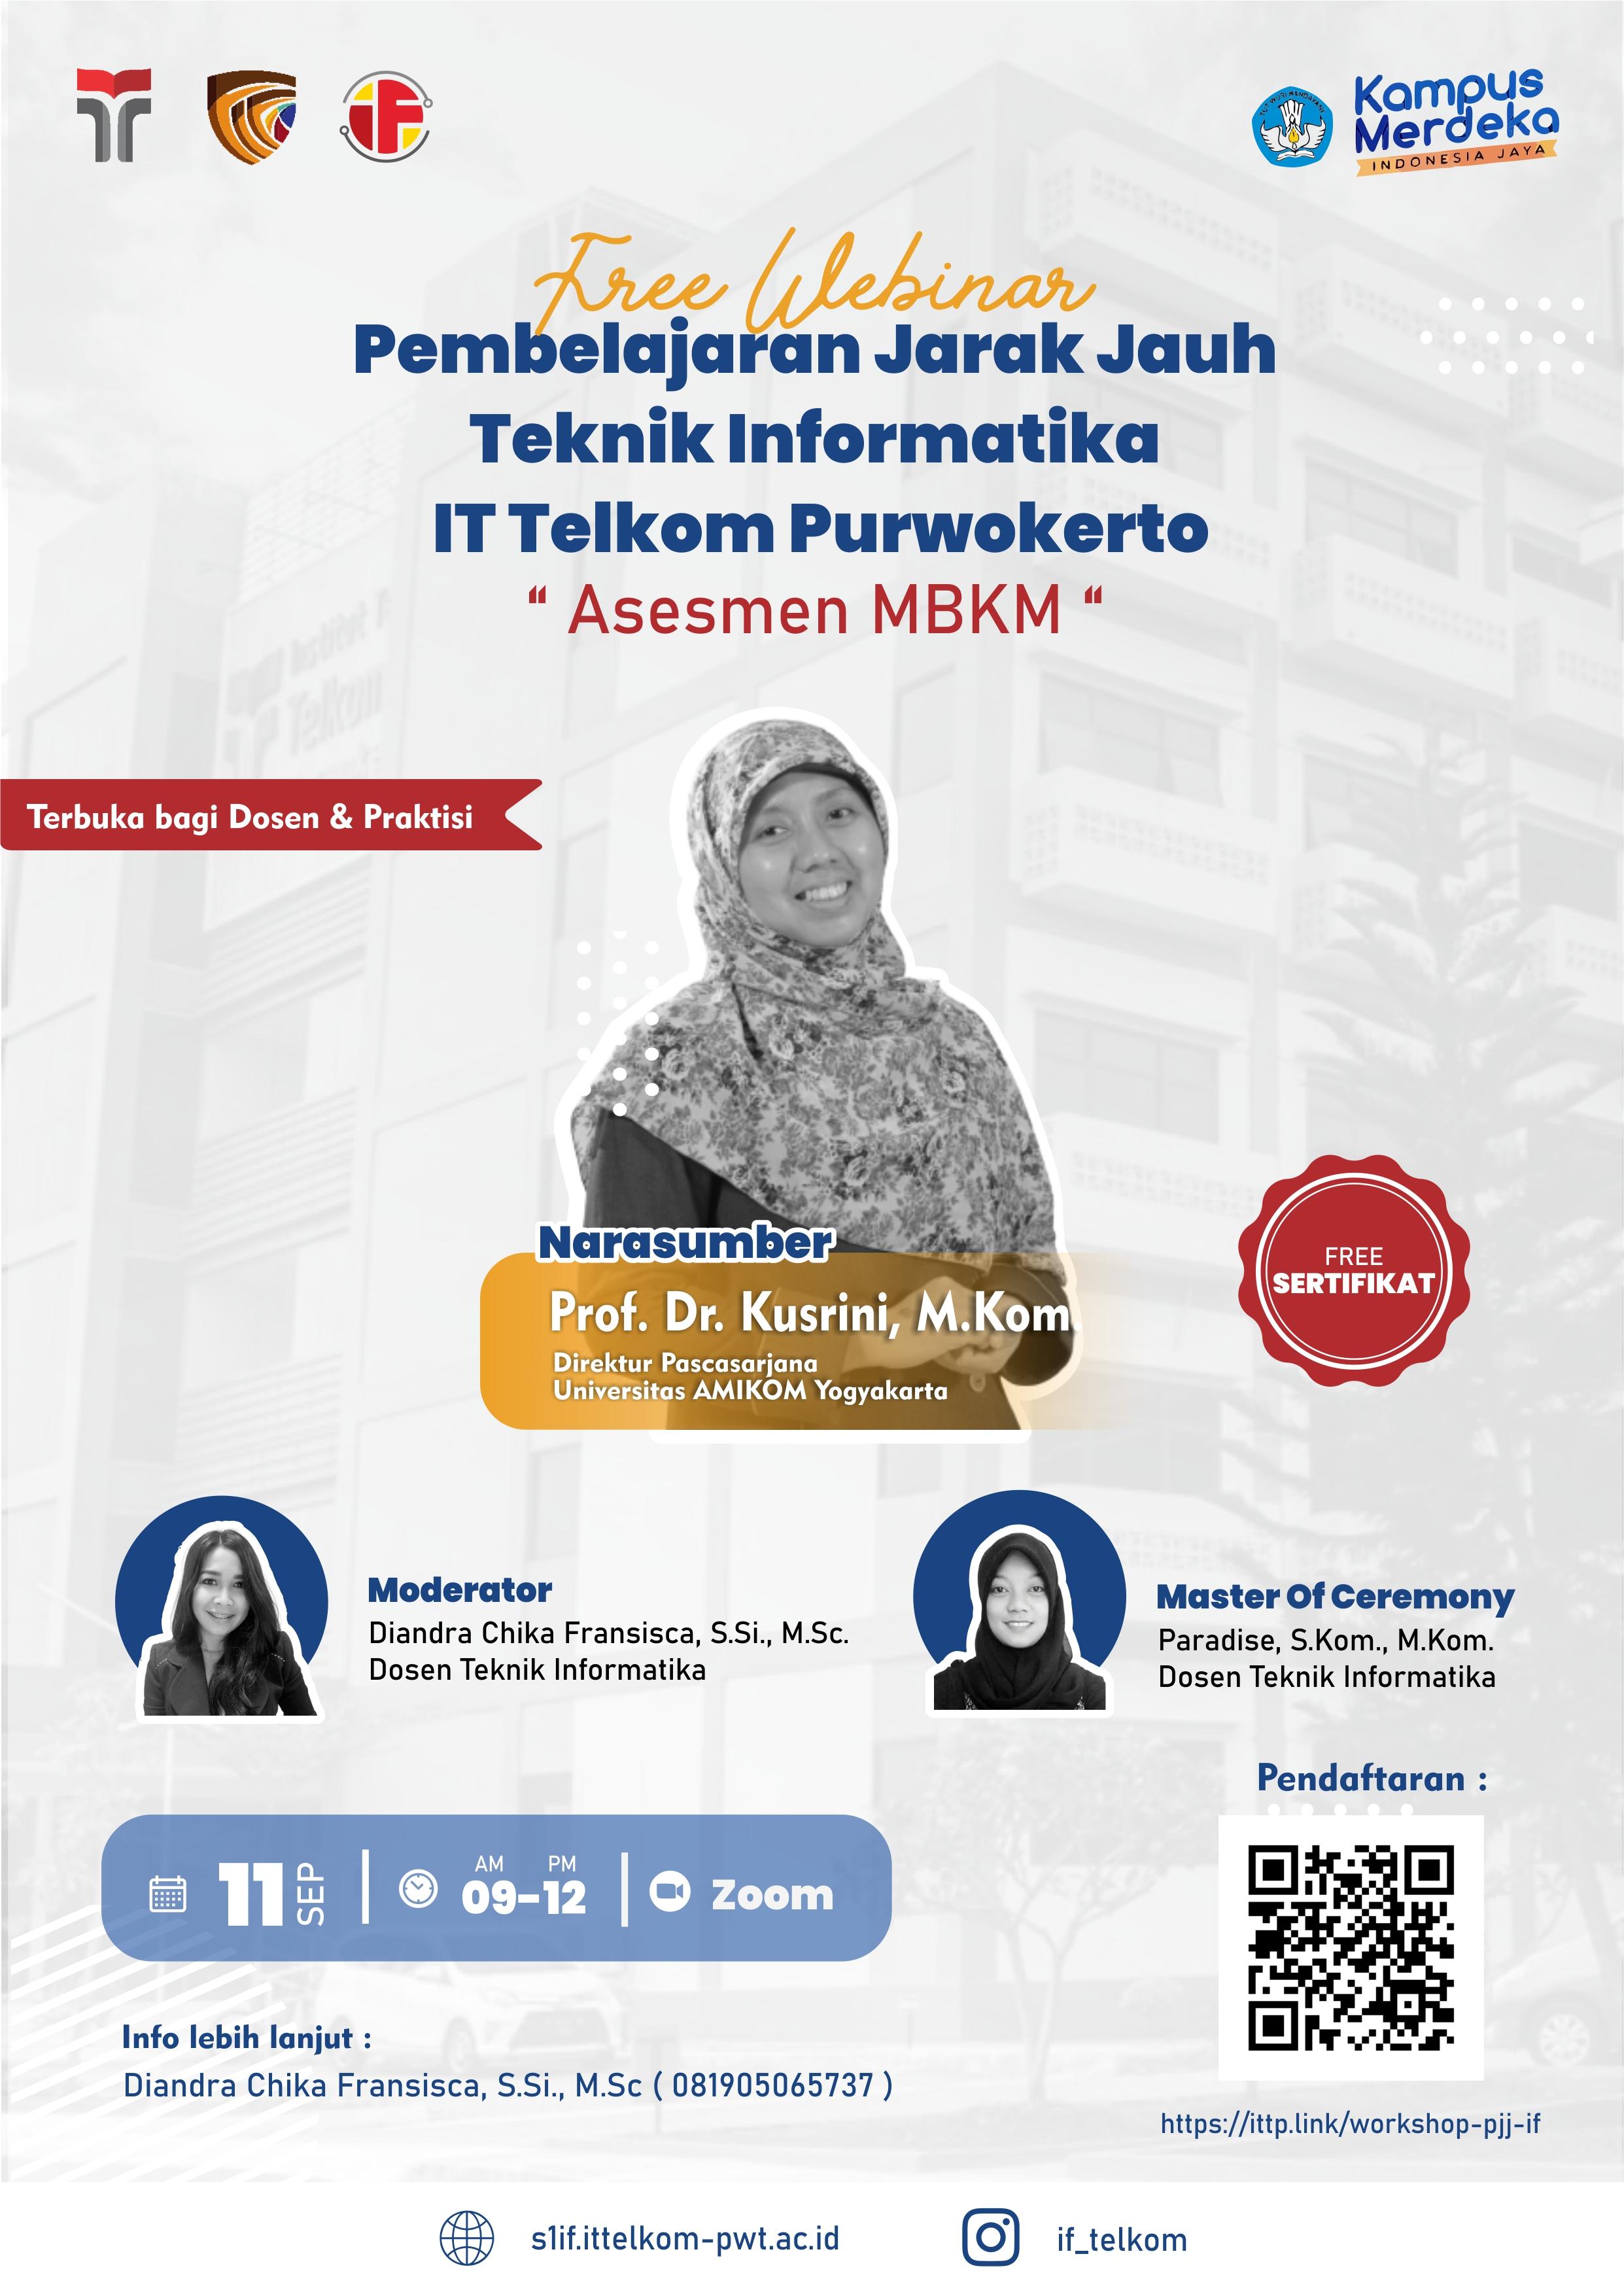 Pembelajaran Jarak Jauh Teknik Informatika IT Telkom Purwokerto